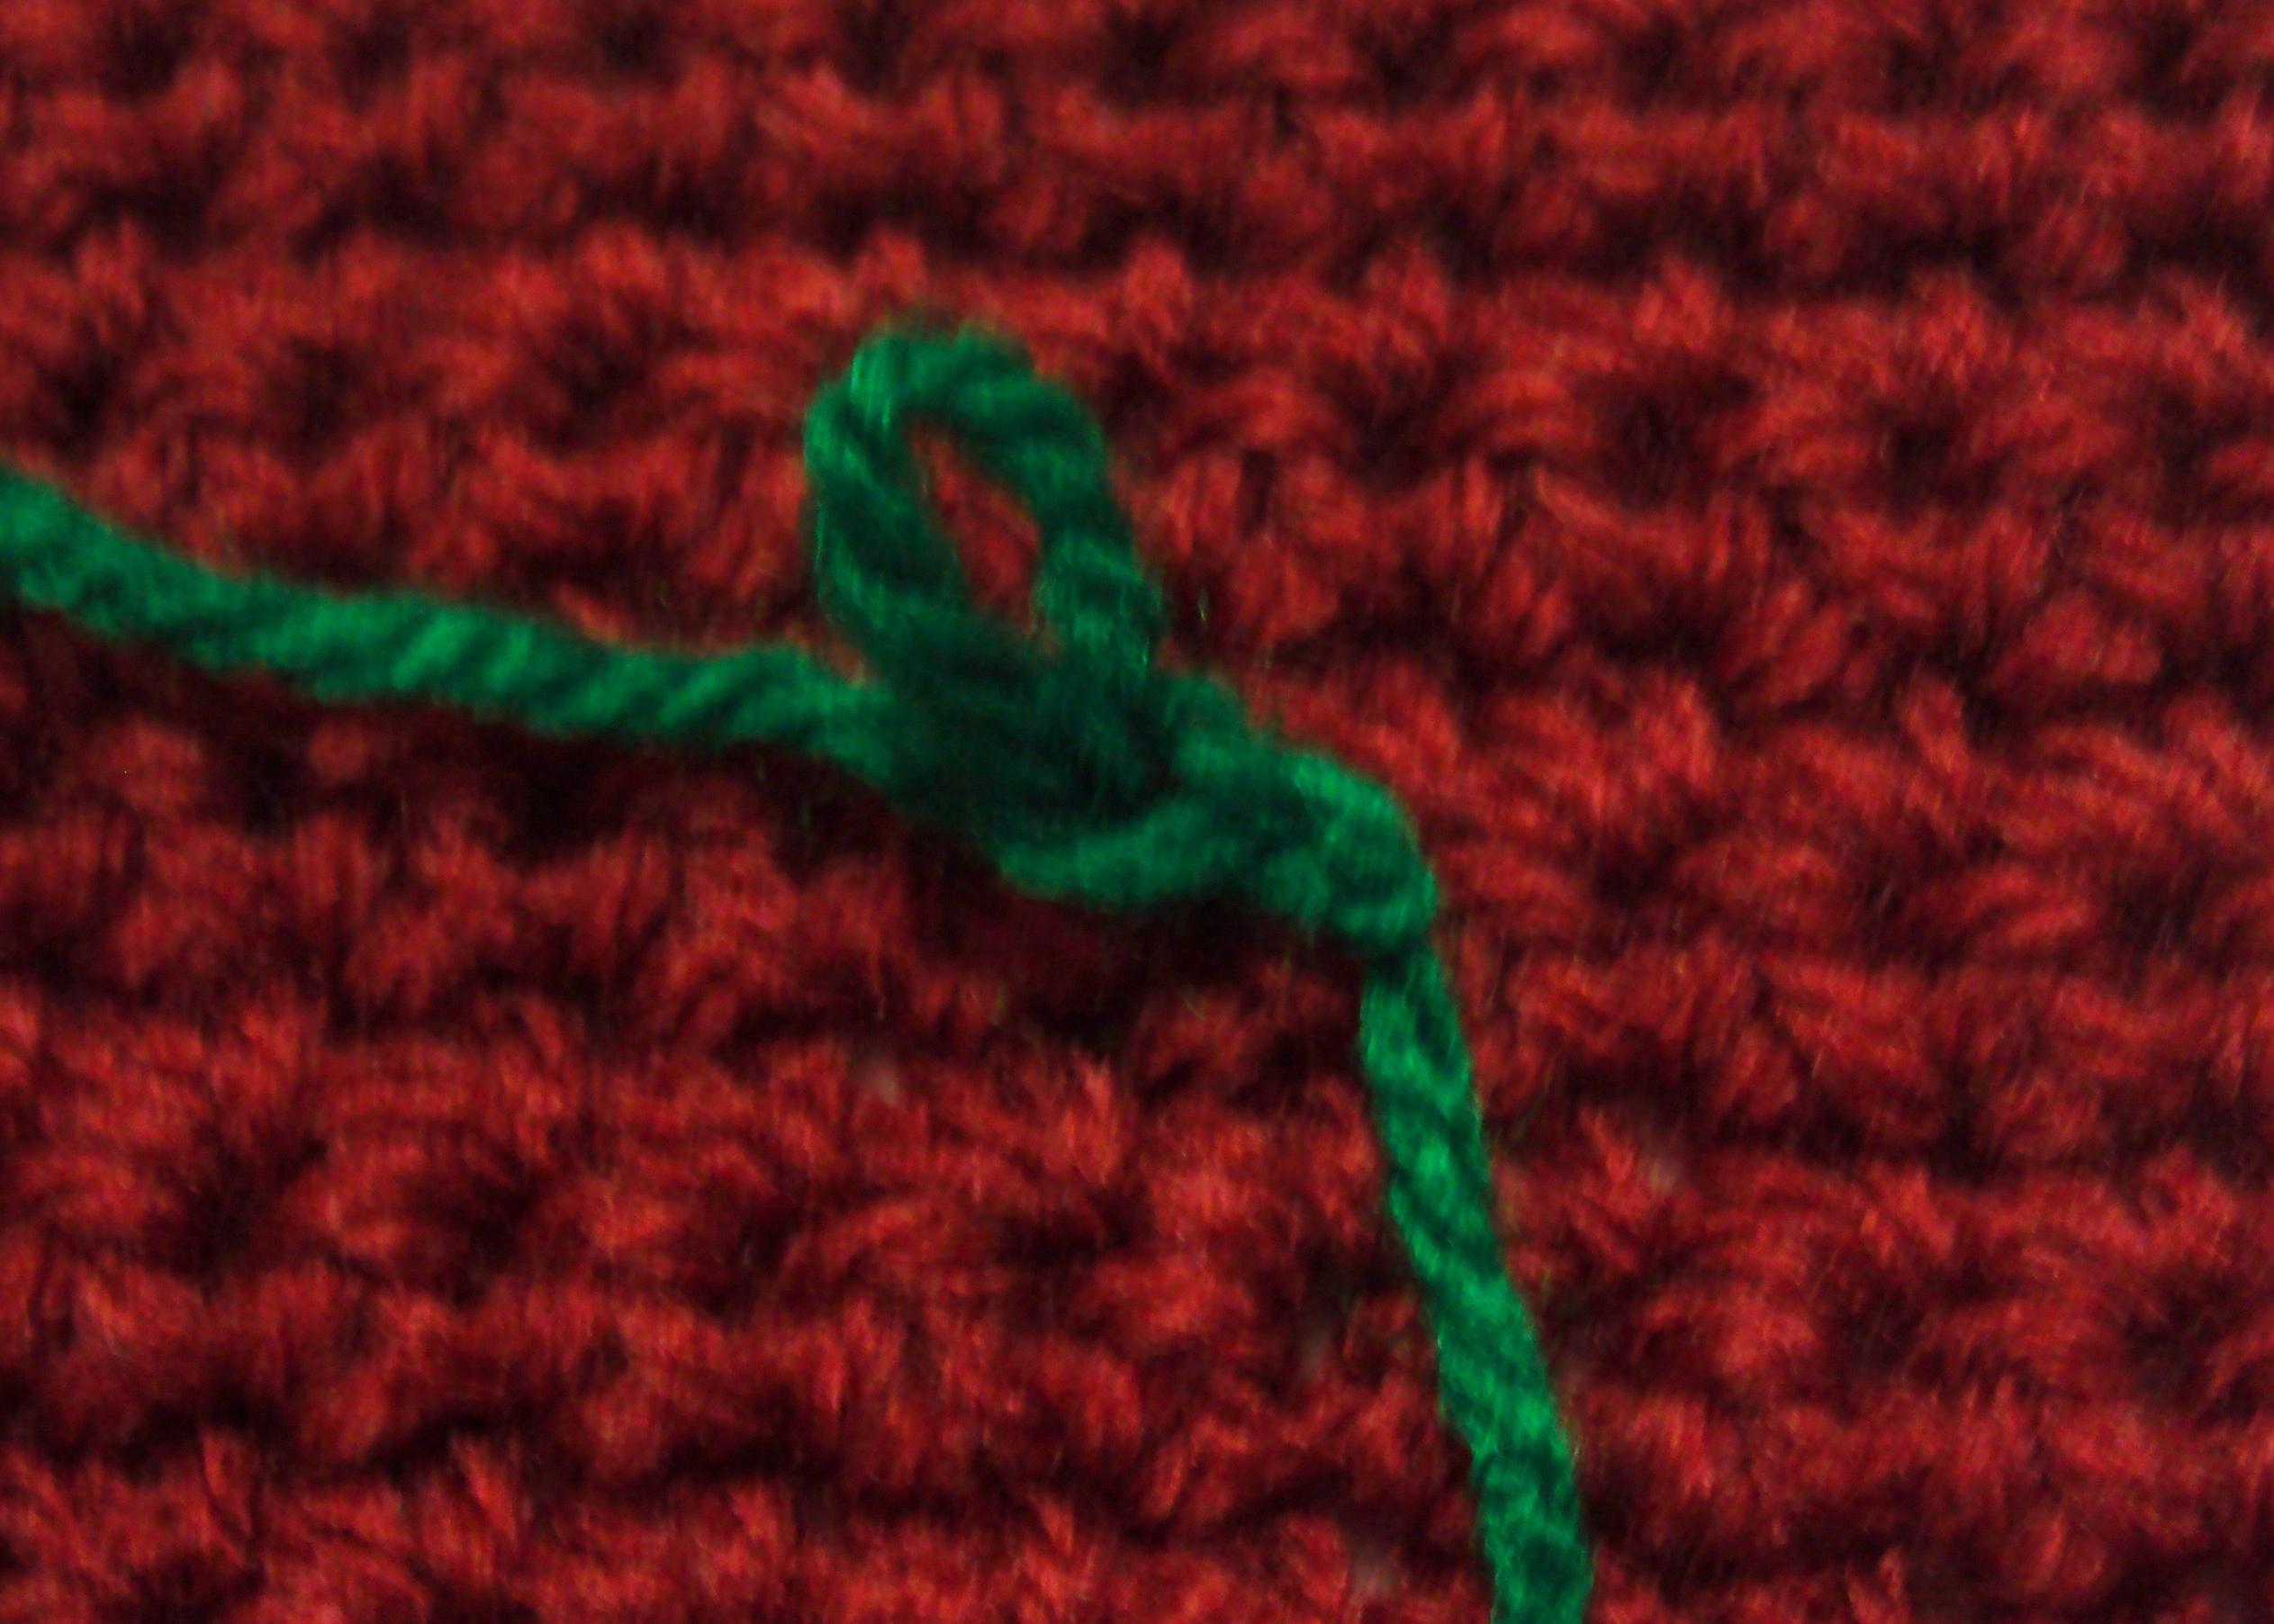 Crochet Spot » Blog Archive » How to Crochet: Surface Crochet or ...